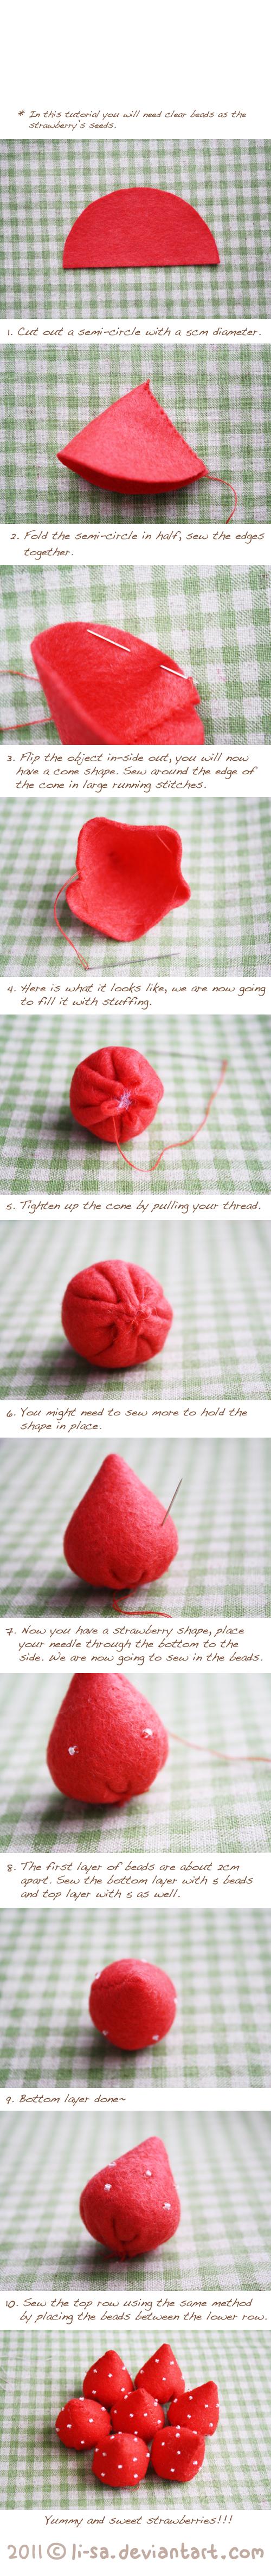 Felt cake tutorial- strawberry by li-sa.deviantart.com on @deviantART